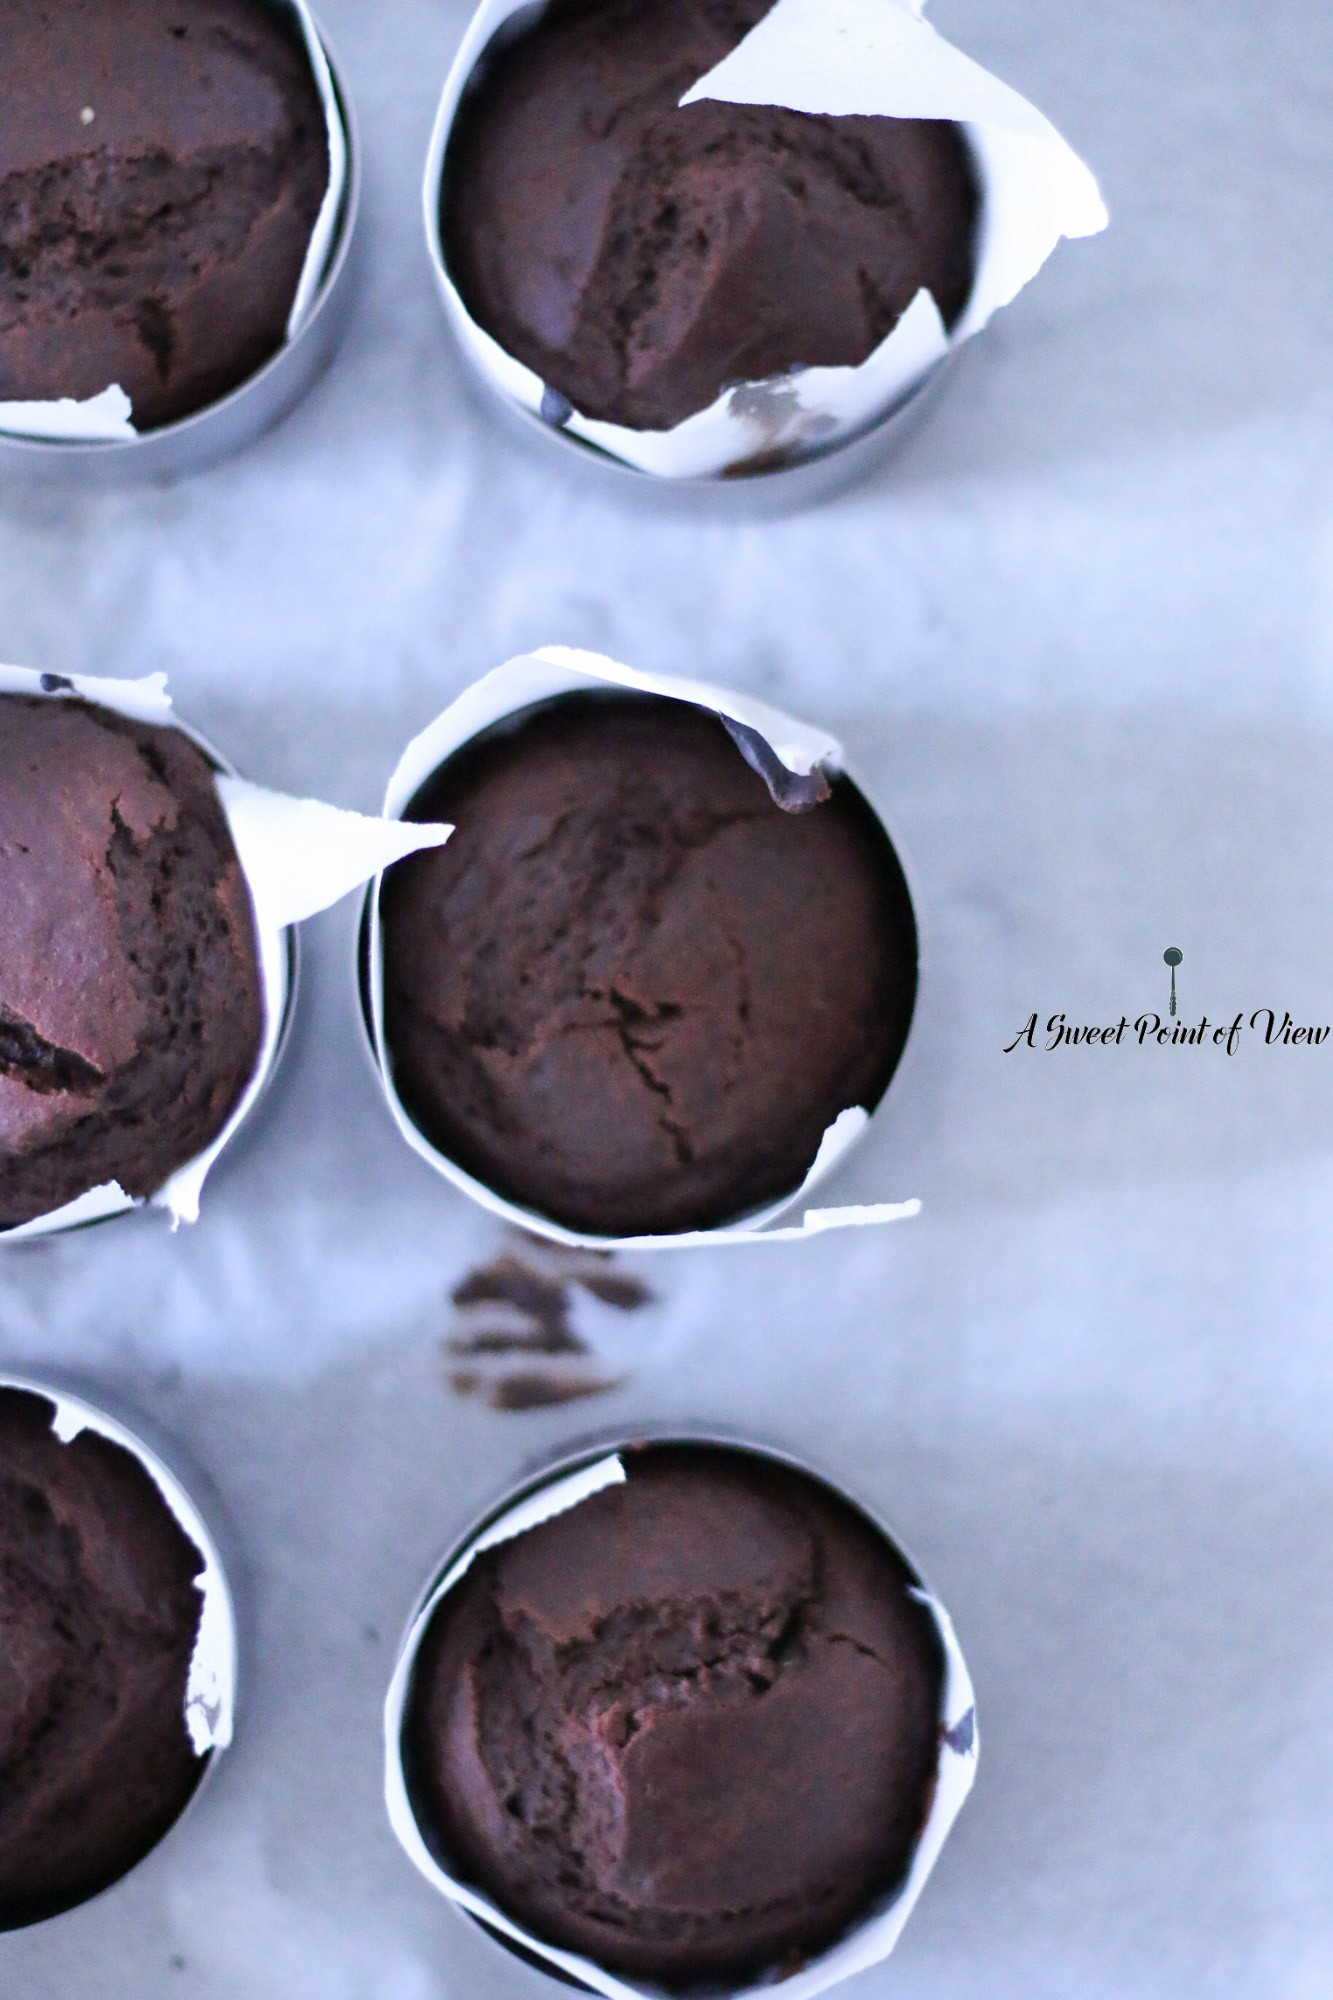 2-sablechocolate-cakes-hoch-format-dark-food-photography-sweet-point-of-view-melissa-ofoedu-photgraphy-1-von-1